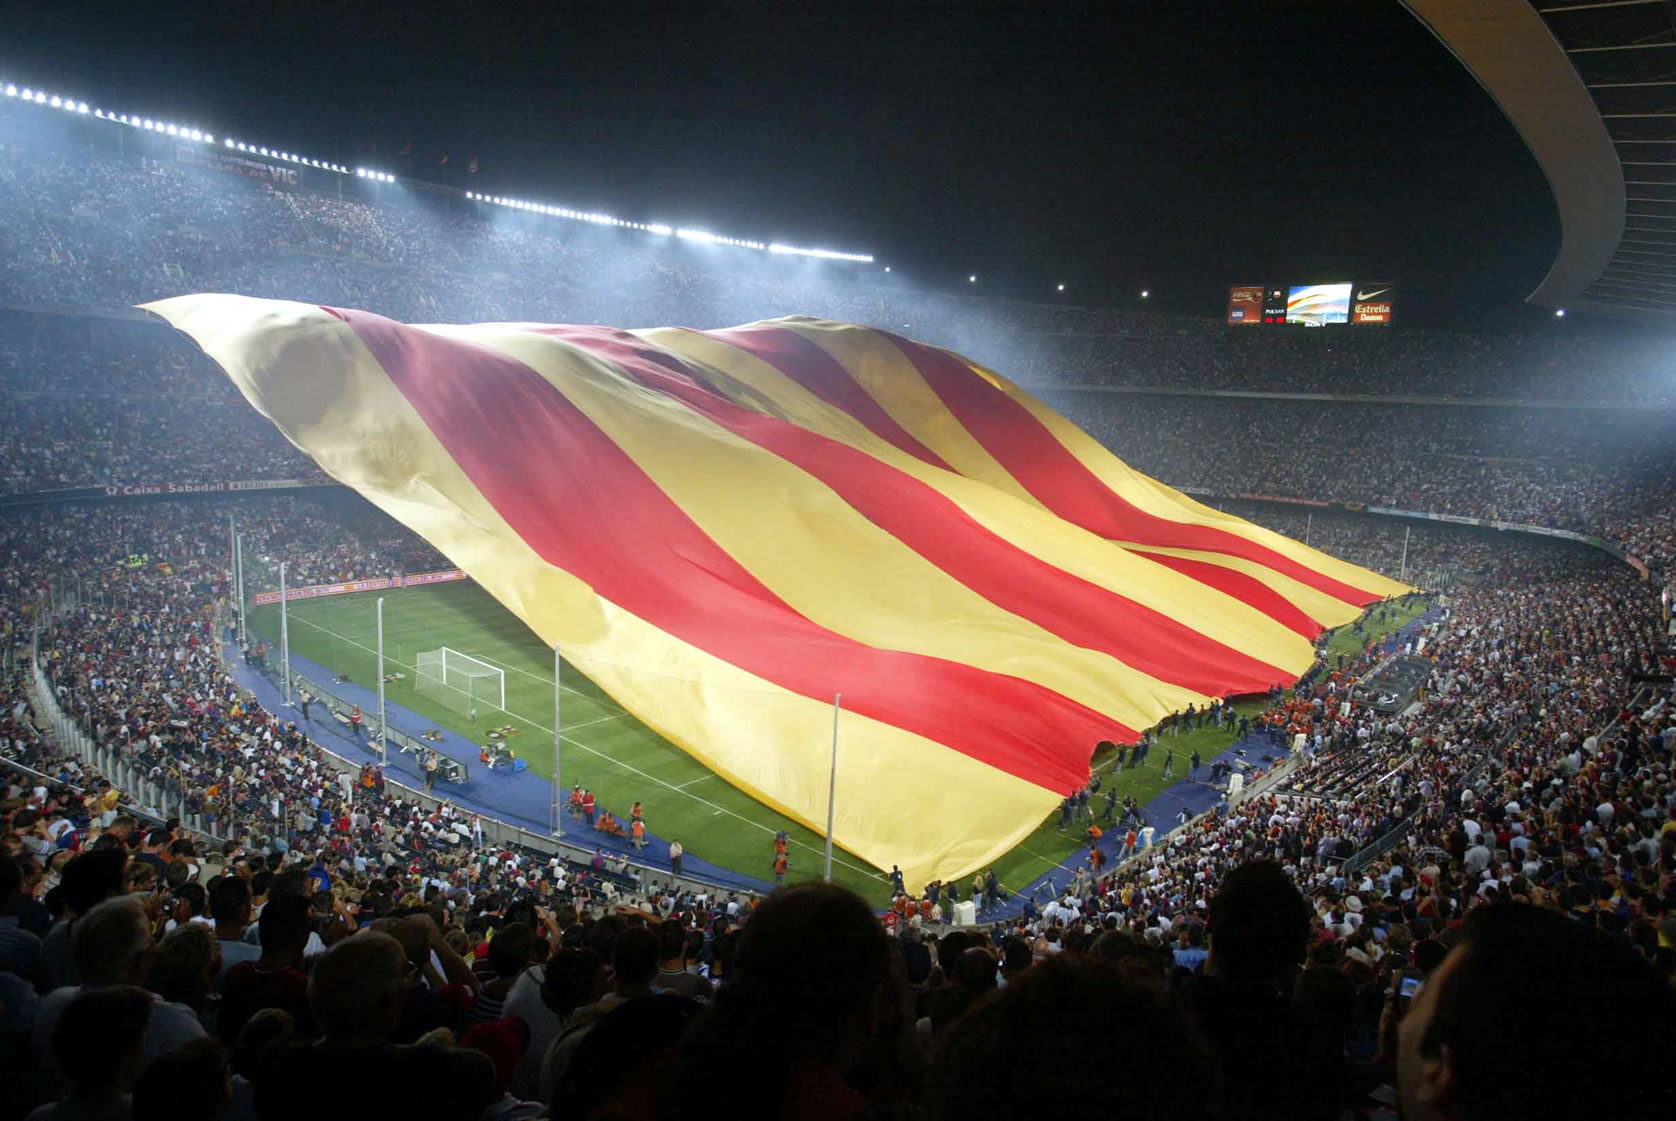 Największa flaga na stadionie